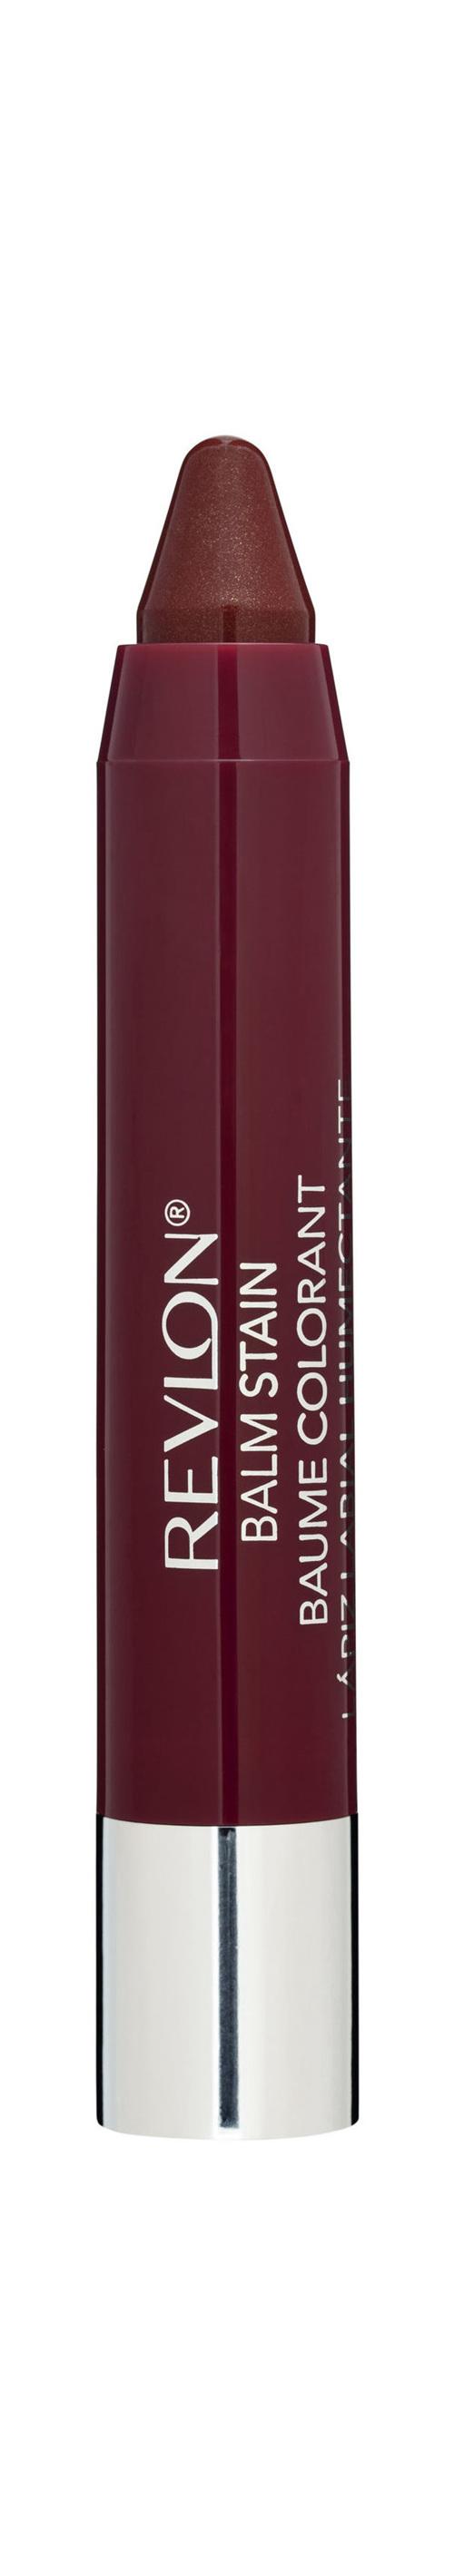 Revlon Colorburst™ Balm Stain Adore